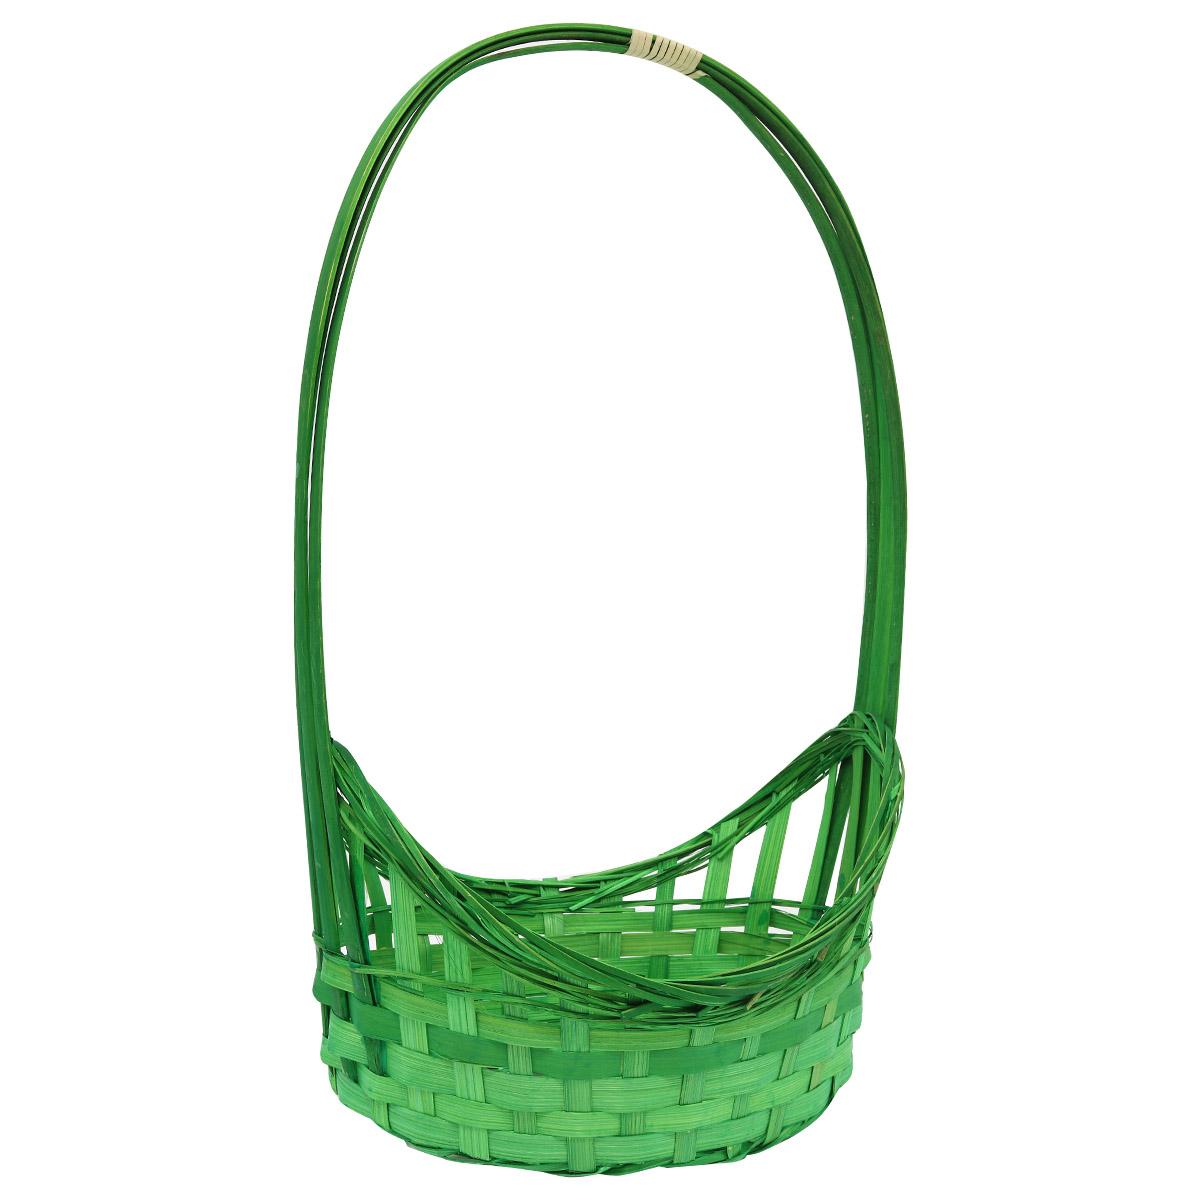 19HJ19080 Корзина плетеная бамбук, 25,5*19*14*9*Н38см, цв. зеленый Астра